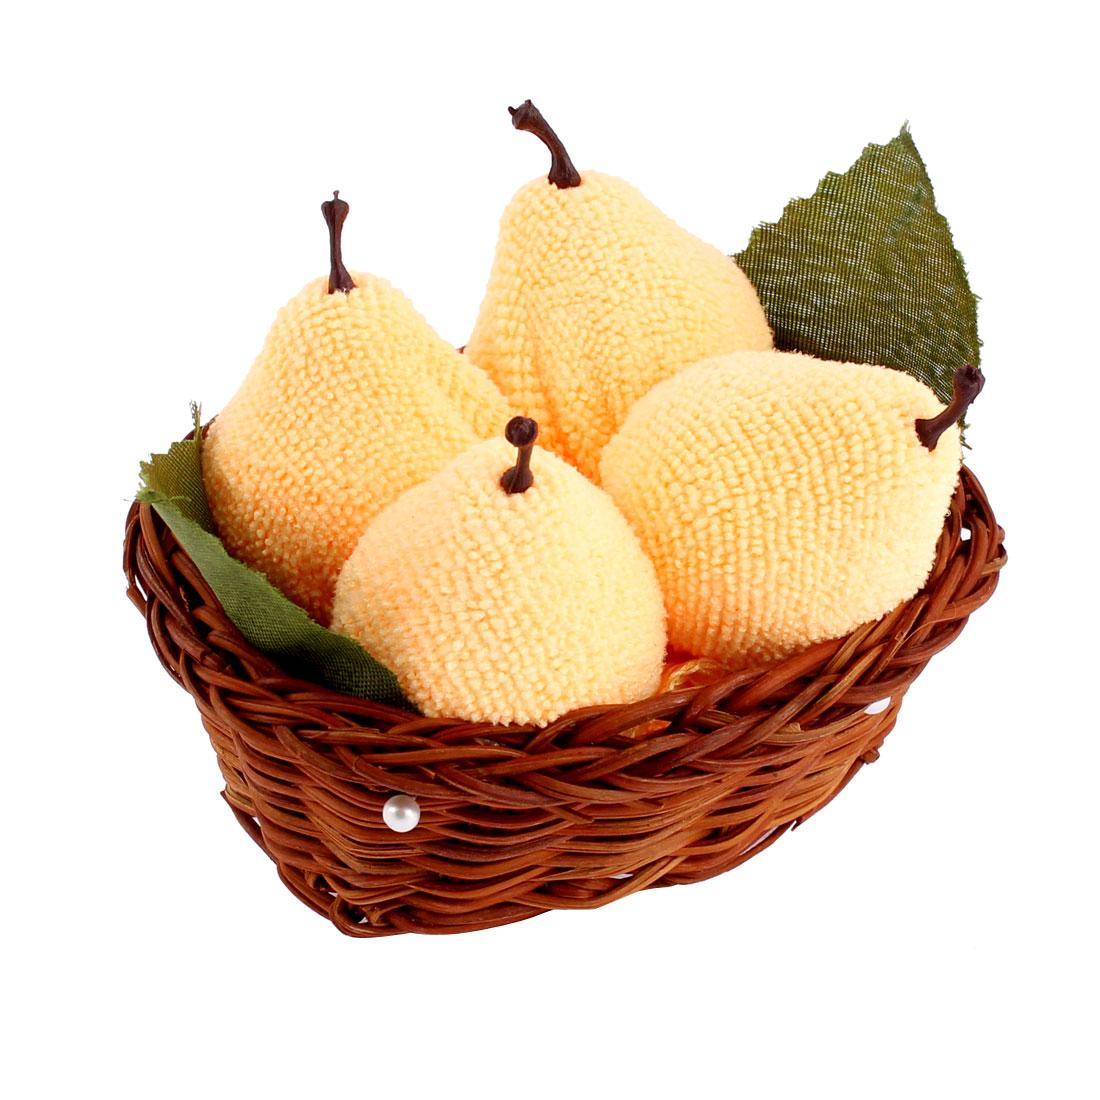 Pear Design Basket Decor Wedding Party Gift Fold Washcloth Hand Towel Yellow